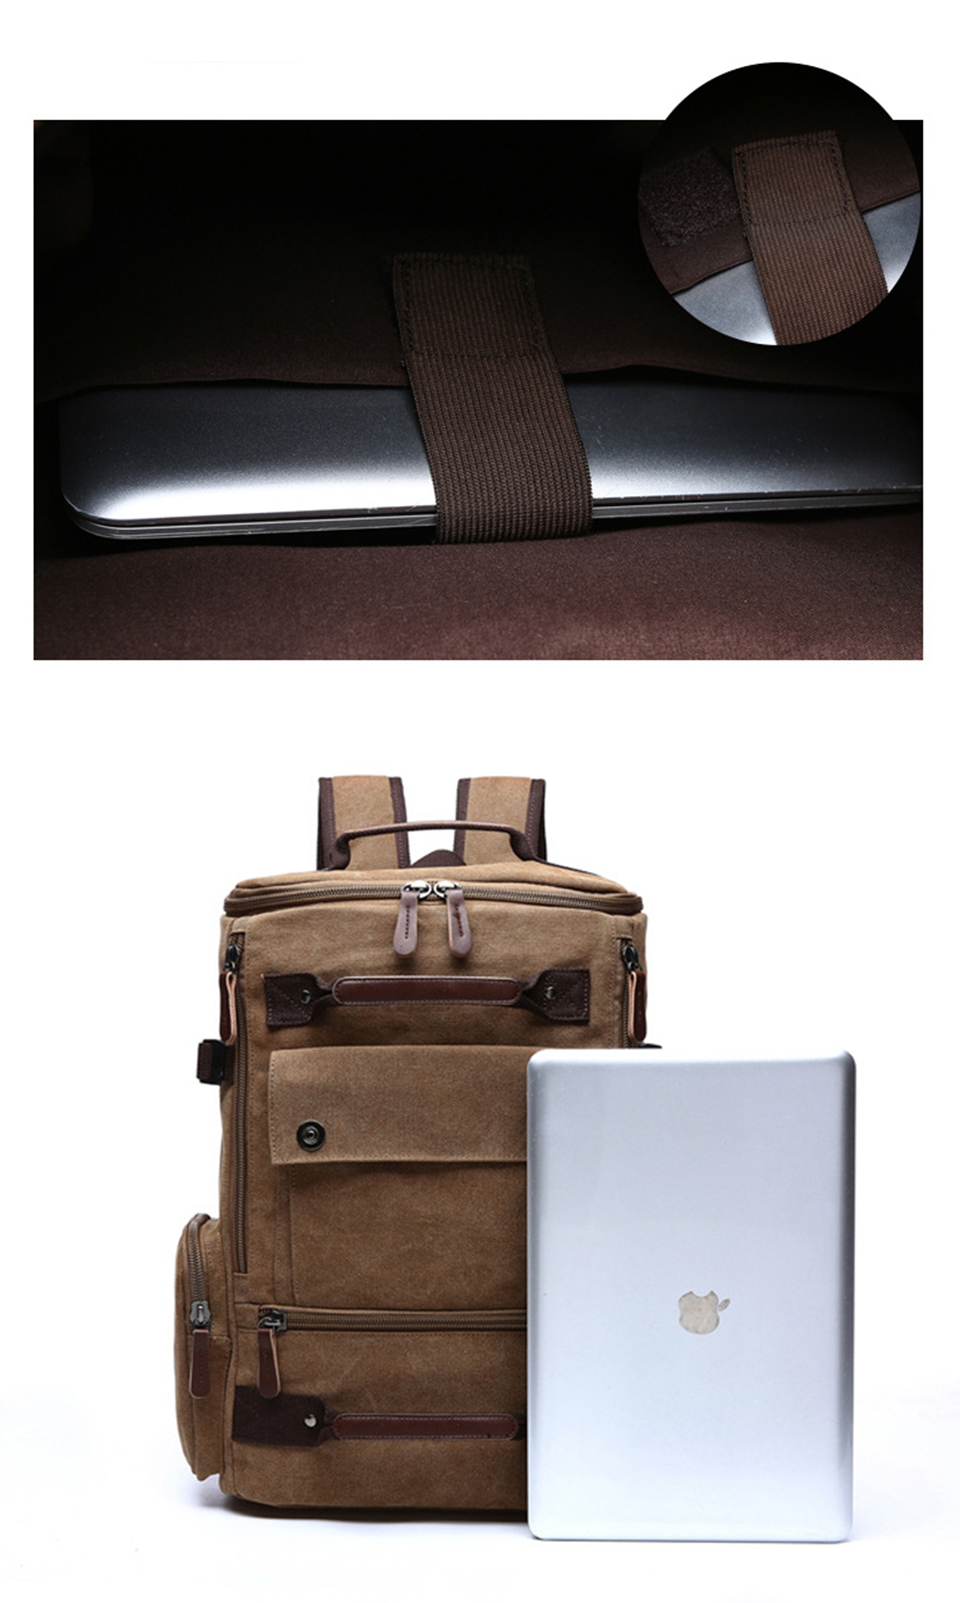 11 Canvas Backpack 15.6'' Laptop Backpacks Men Bagpack Wearproof School Bag for Teenage Male Knapsack Travel Bags Fashion Rucksack